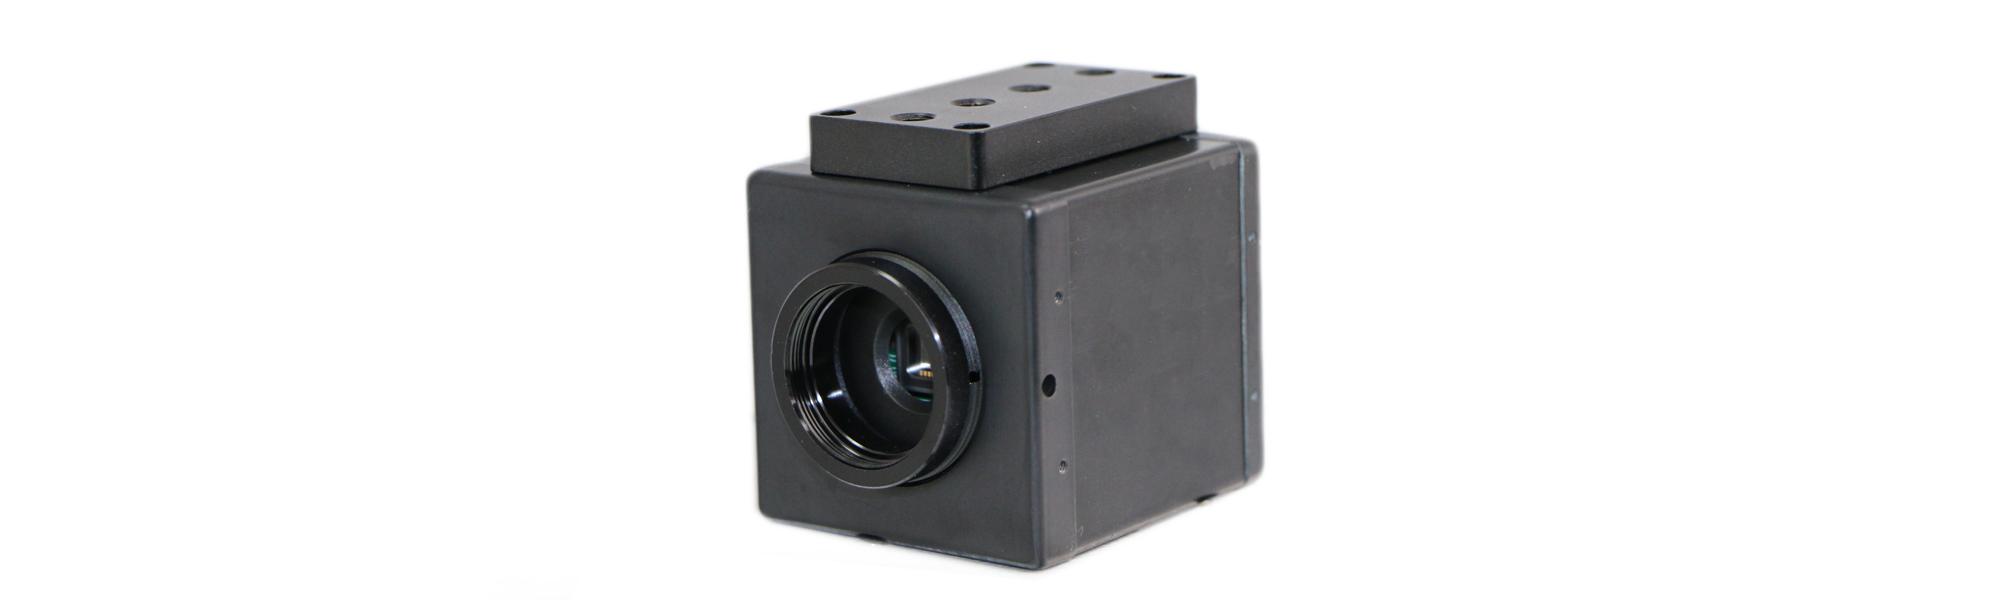 Modern Firewire Camera Vignette - Electrical and Wiring Diagram ...